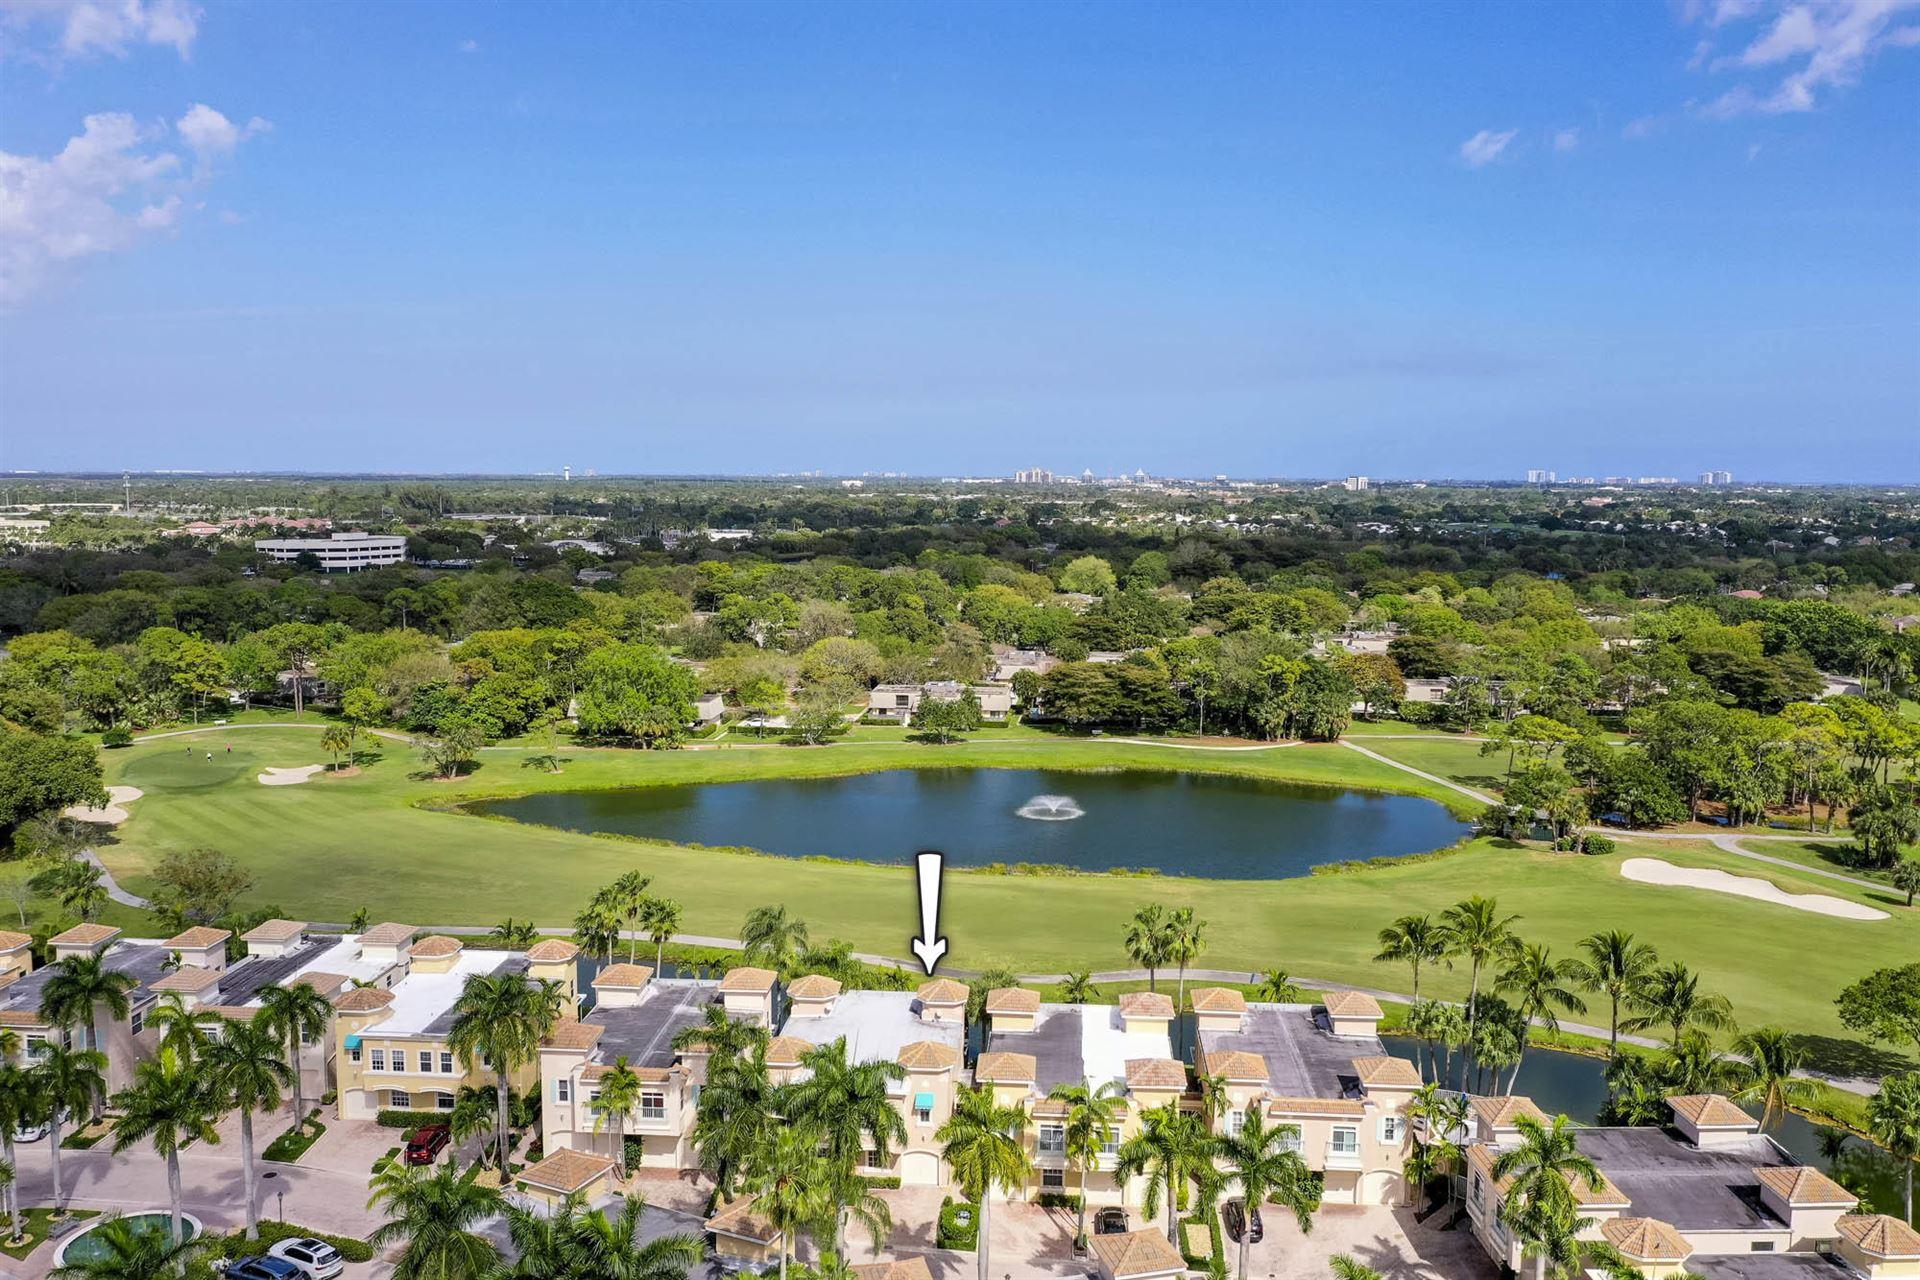 Photo of 204 Resort Lane, Palm Beach Gardens, FL 33418 (MLS # RX-10697050)